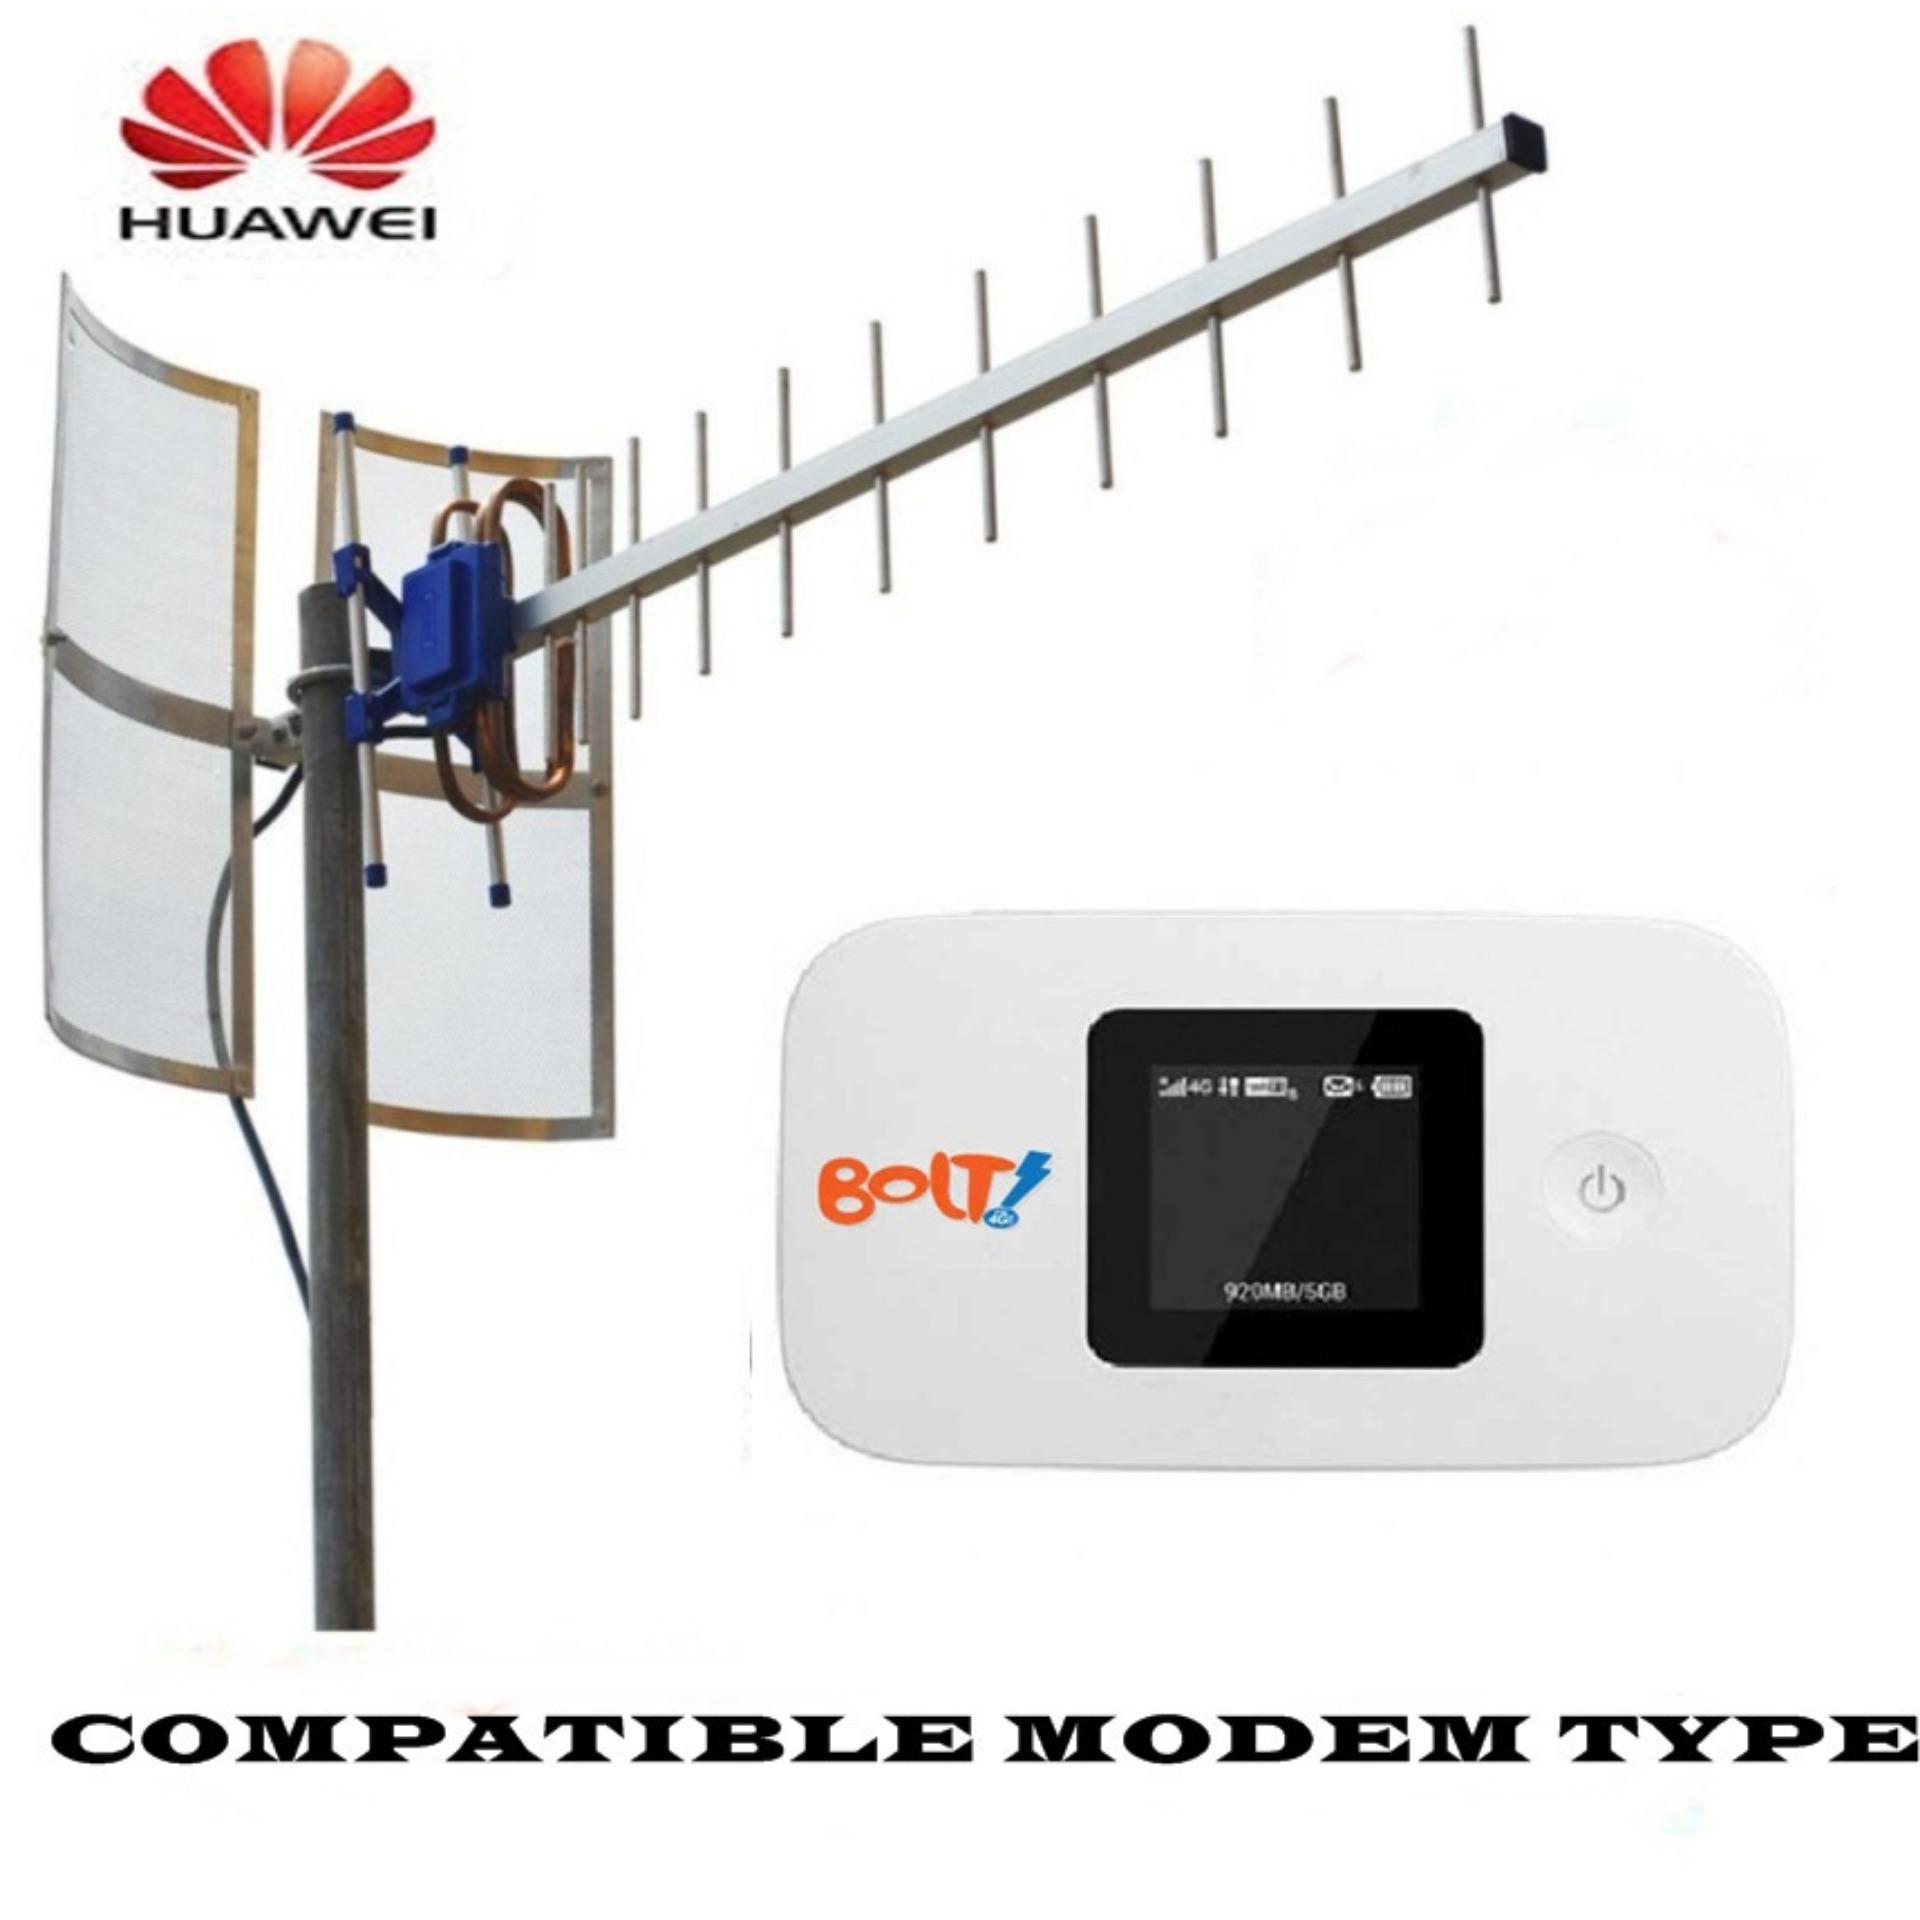 ... Antena Yagi Untuk Modem Huawei E5577 (Bolt Slim2/Max2) TripleDriven TXR 185 ...